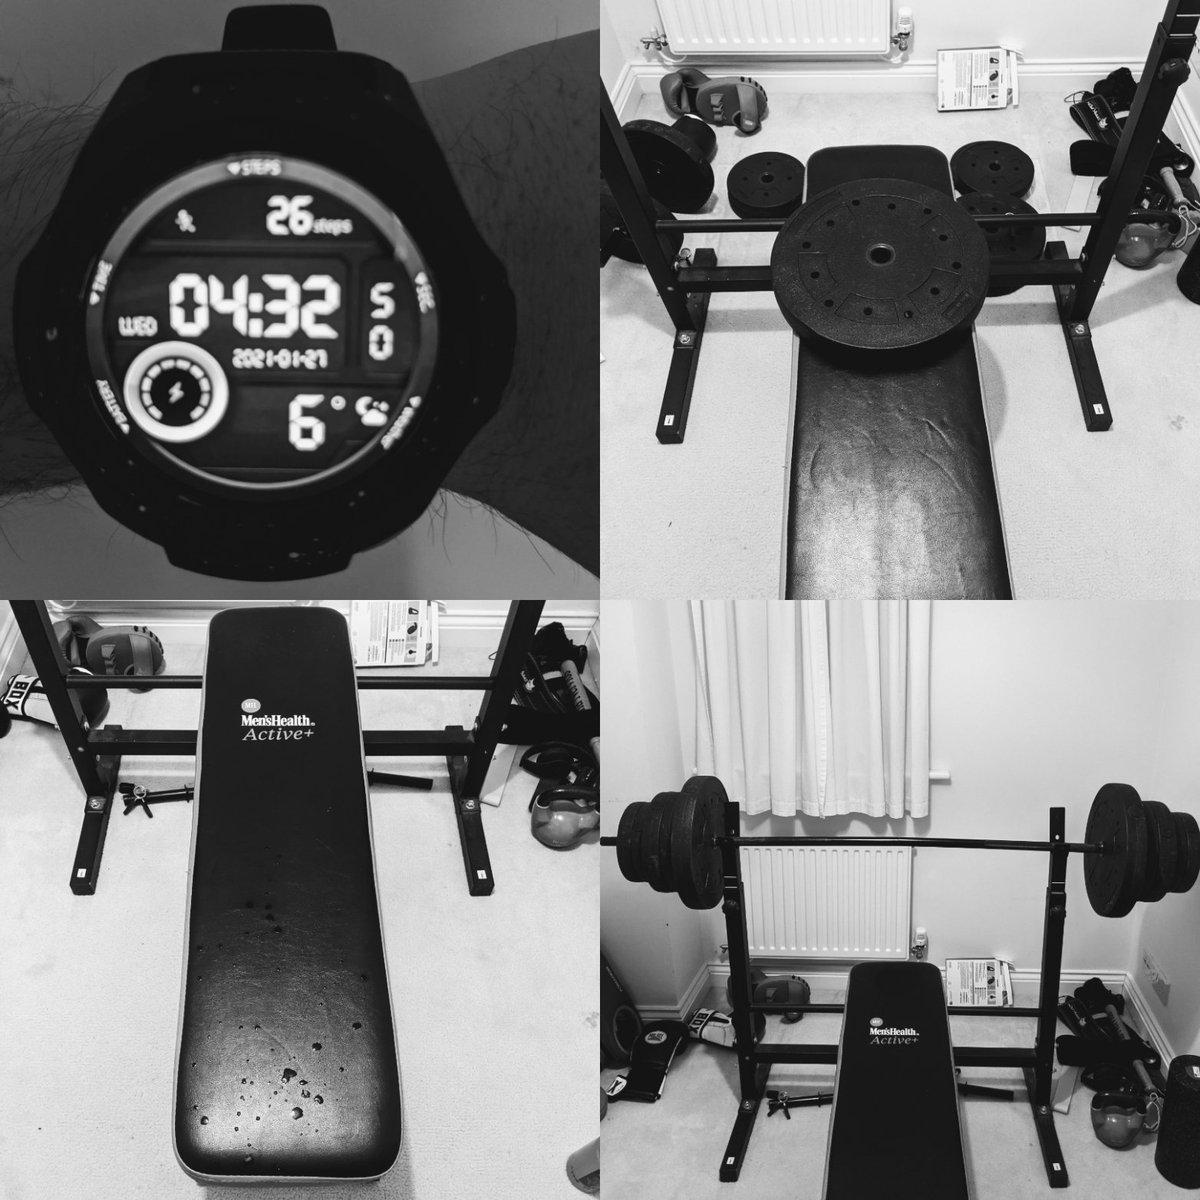 Go go go go go!!! #disciplineroad #Disciplineequalsfreedom #weightlifting #stayhumble #workout #bodybuilding #strengthtraining #discipline #health #muscle #weight #strength #keephammering #cardio #exercise #nobodycaresworkharder #waronweakness #GetAfterit #0430club #0430clubuk